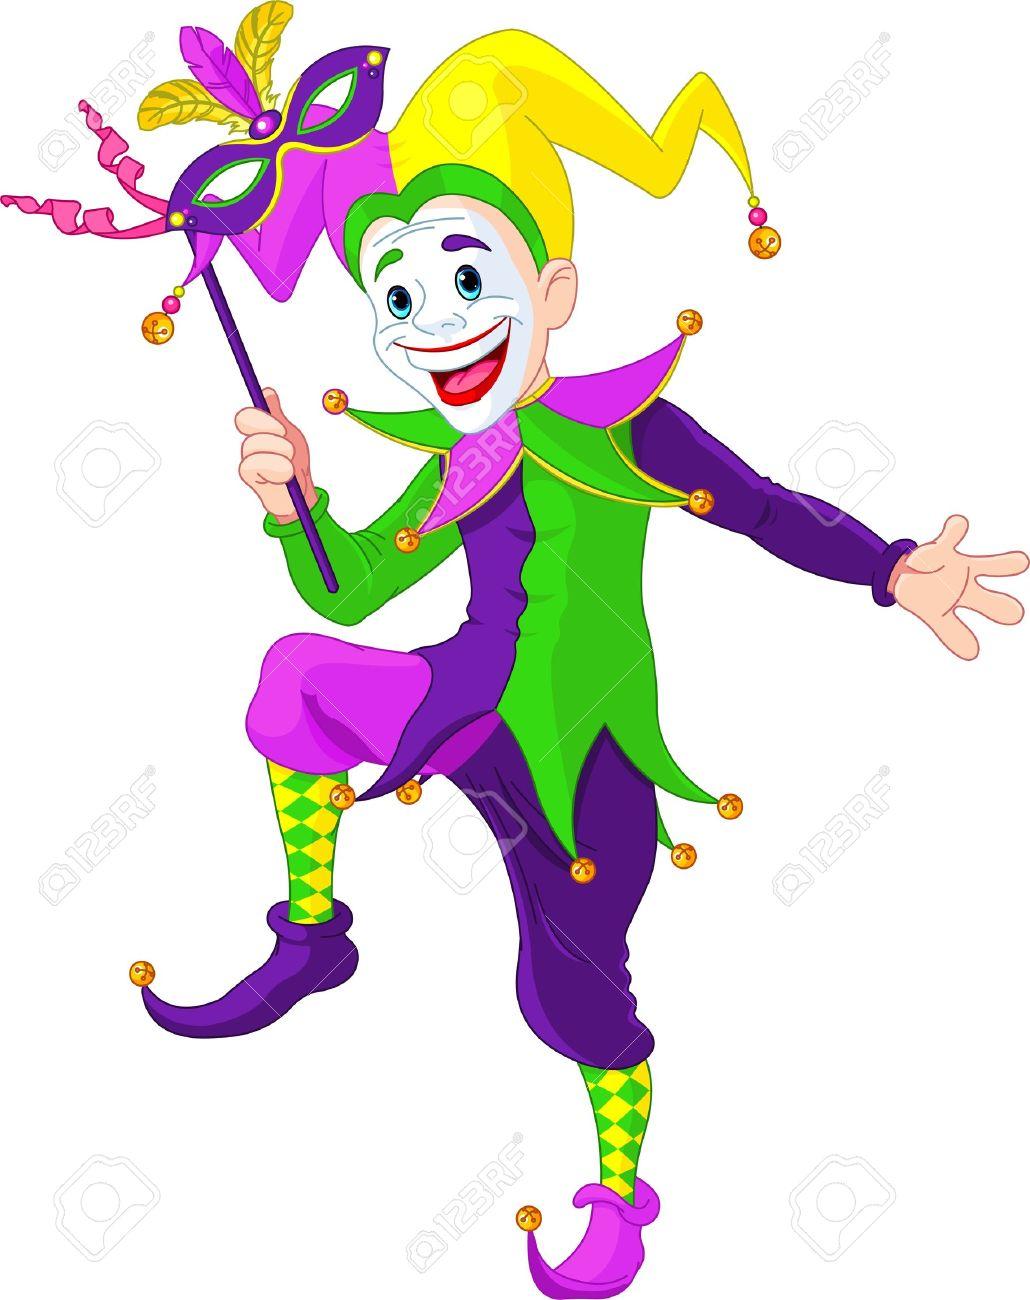 Clip art illustration of a cartoon Mardi Gras jester holding...